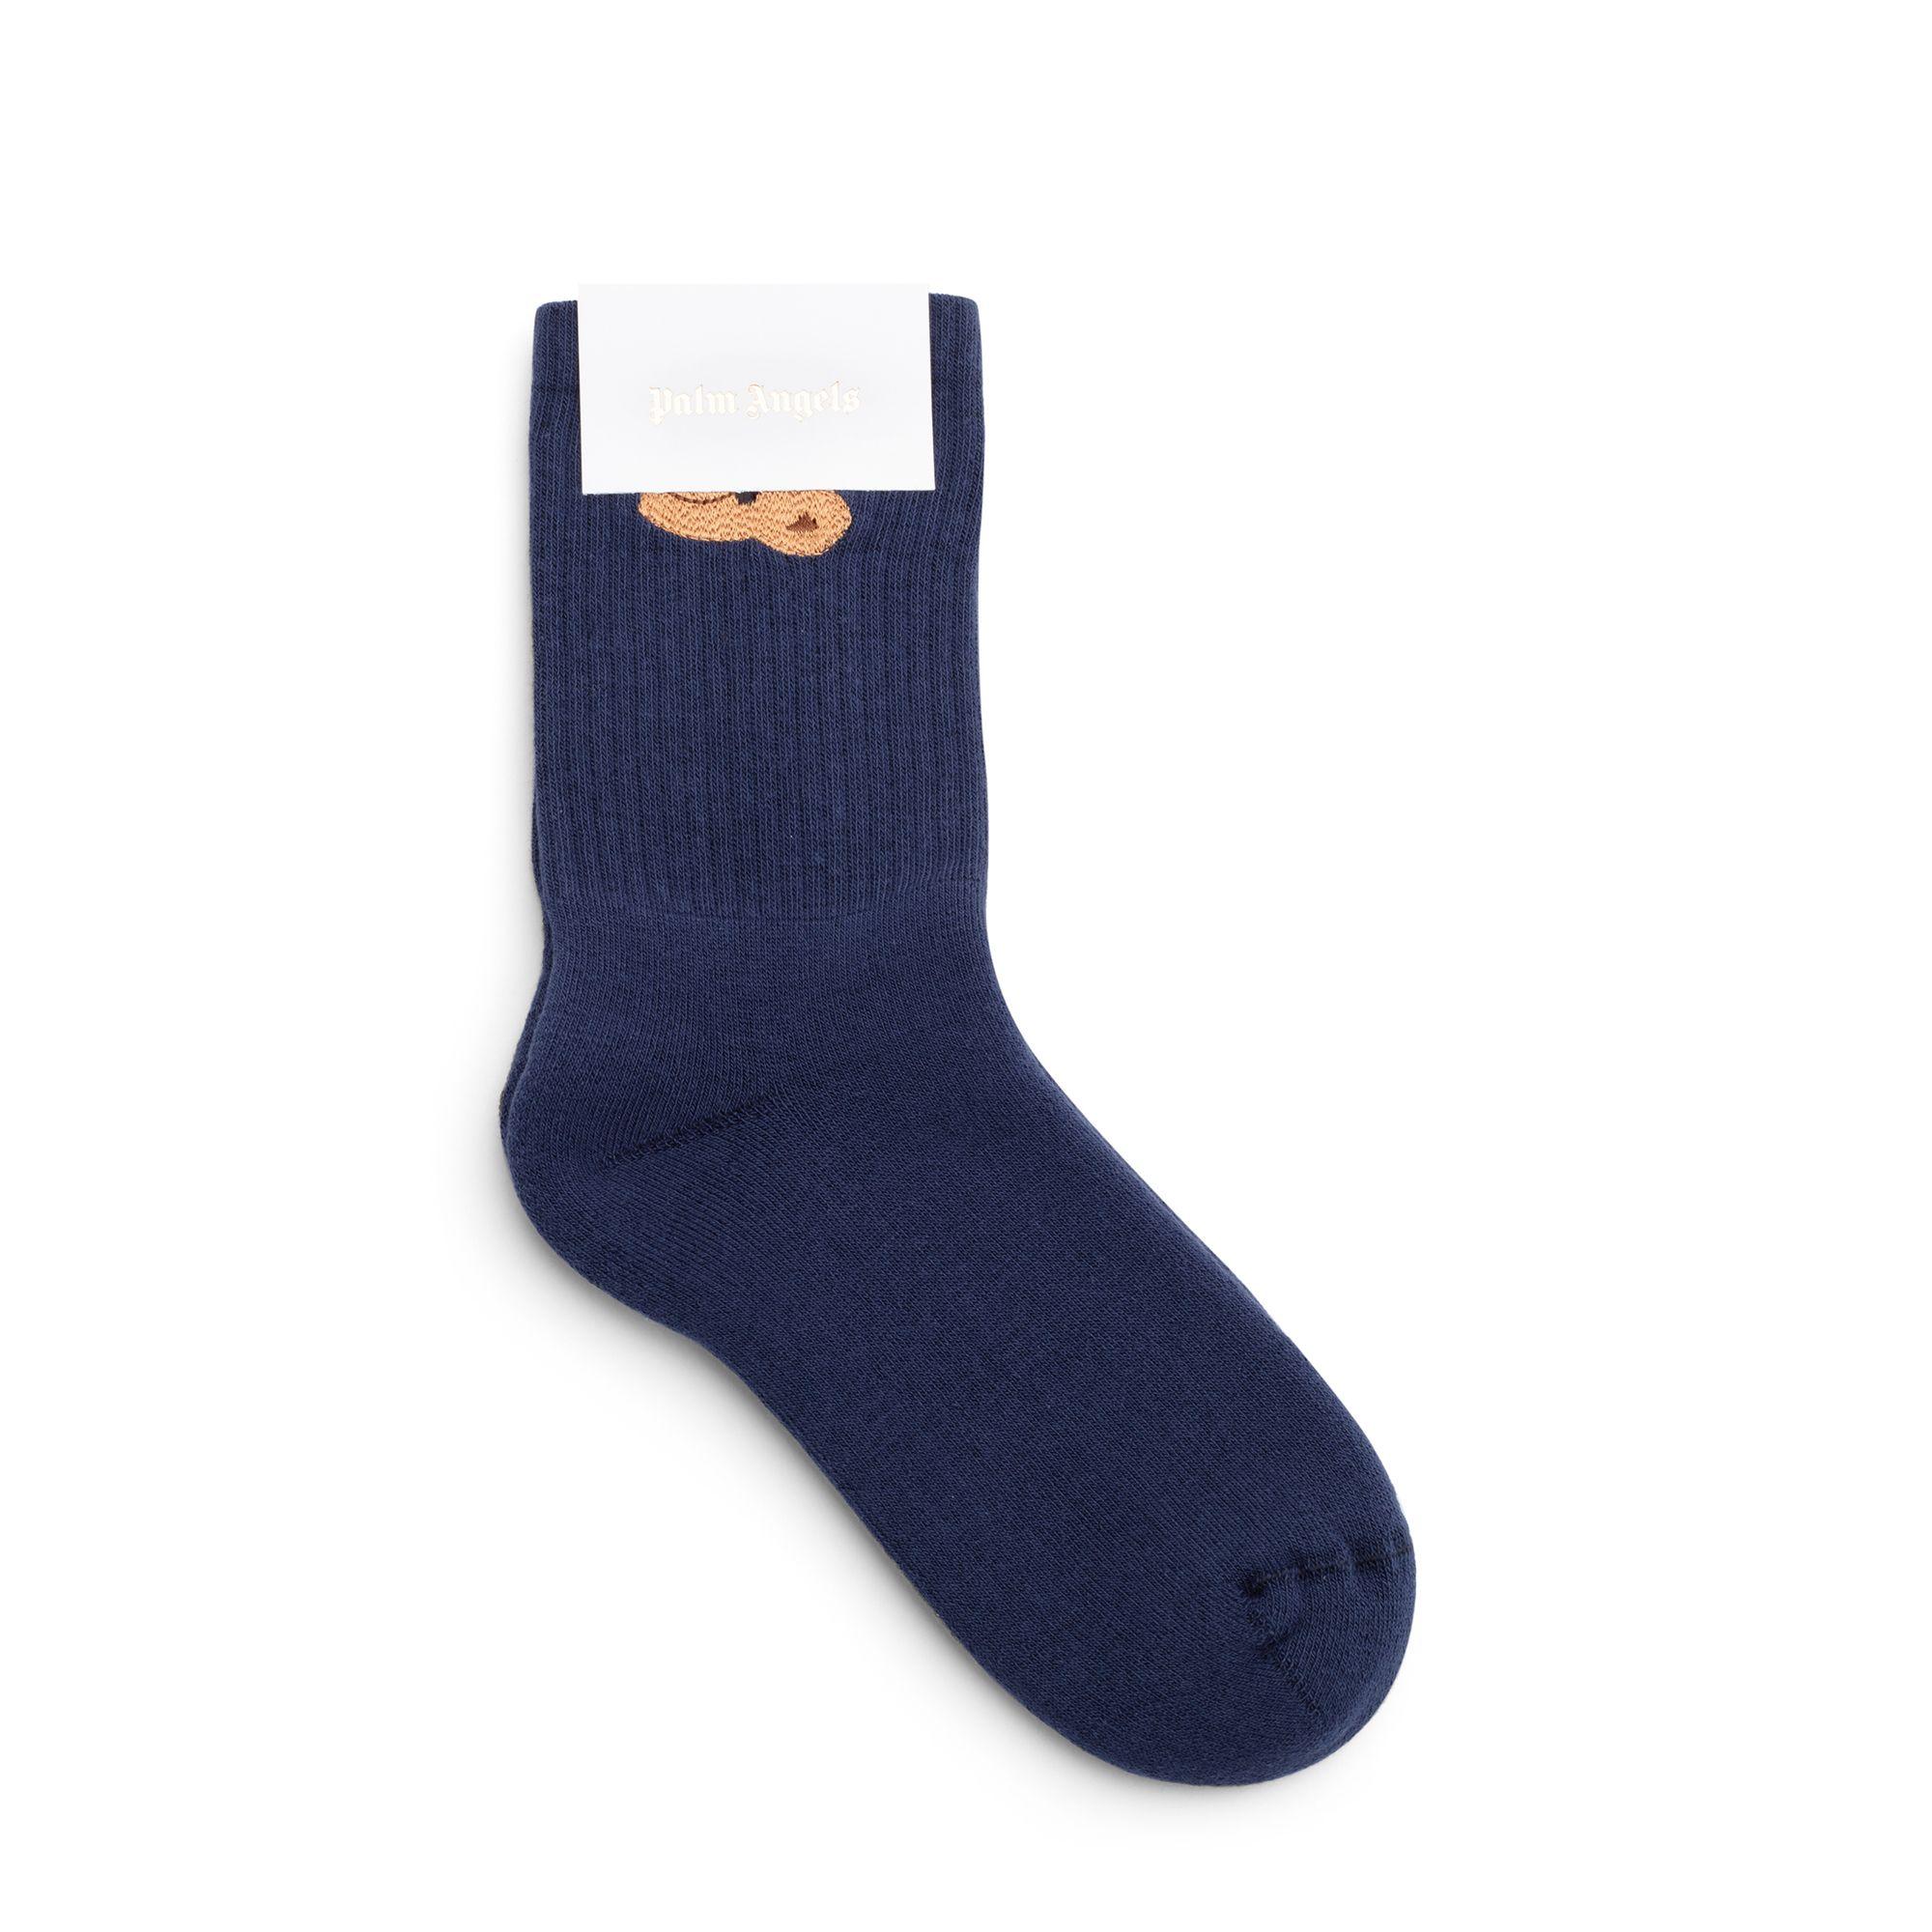 Bear mid-high socks